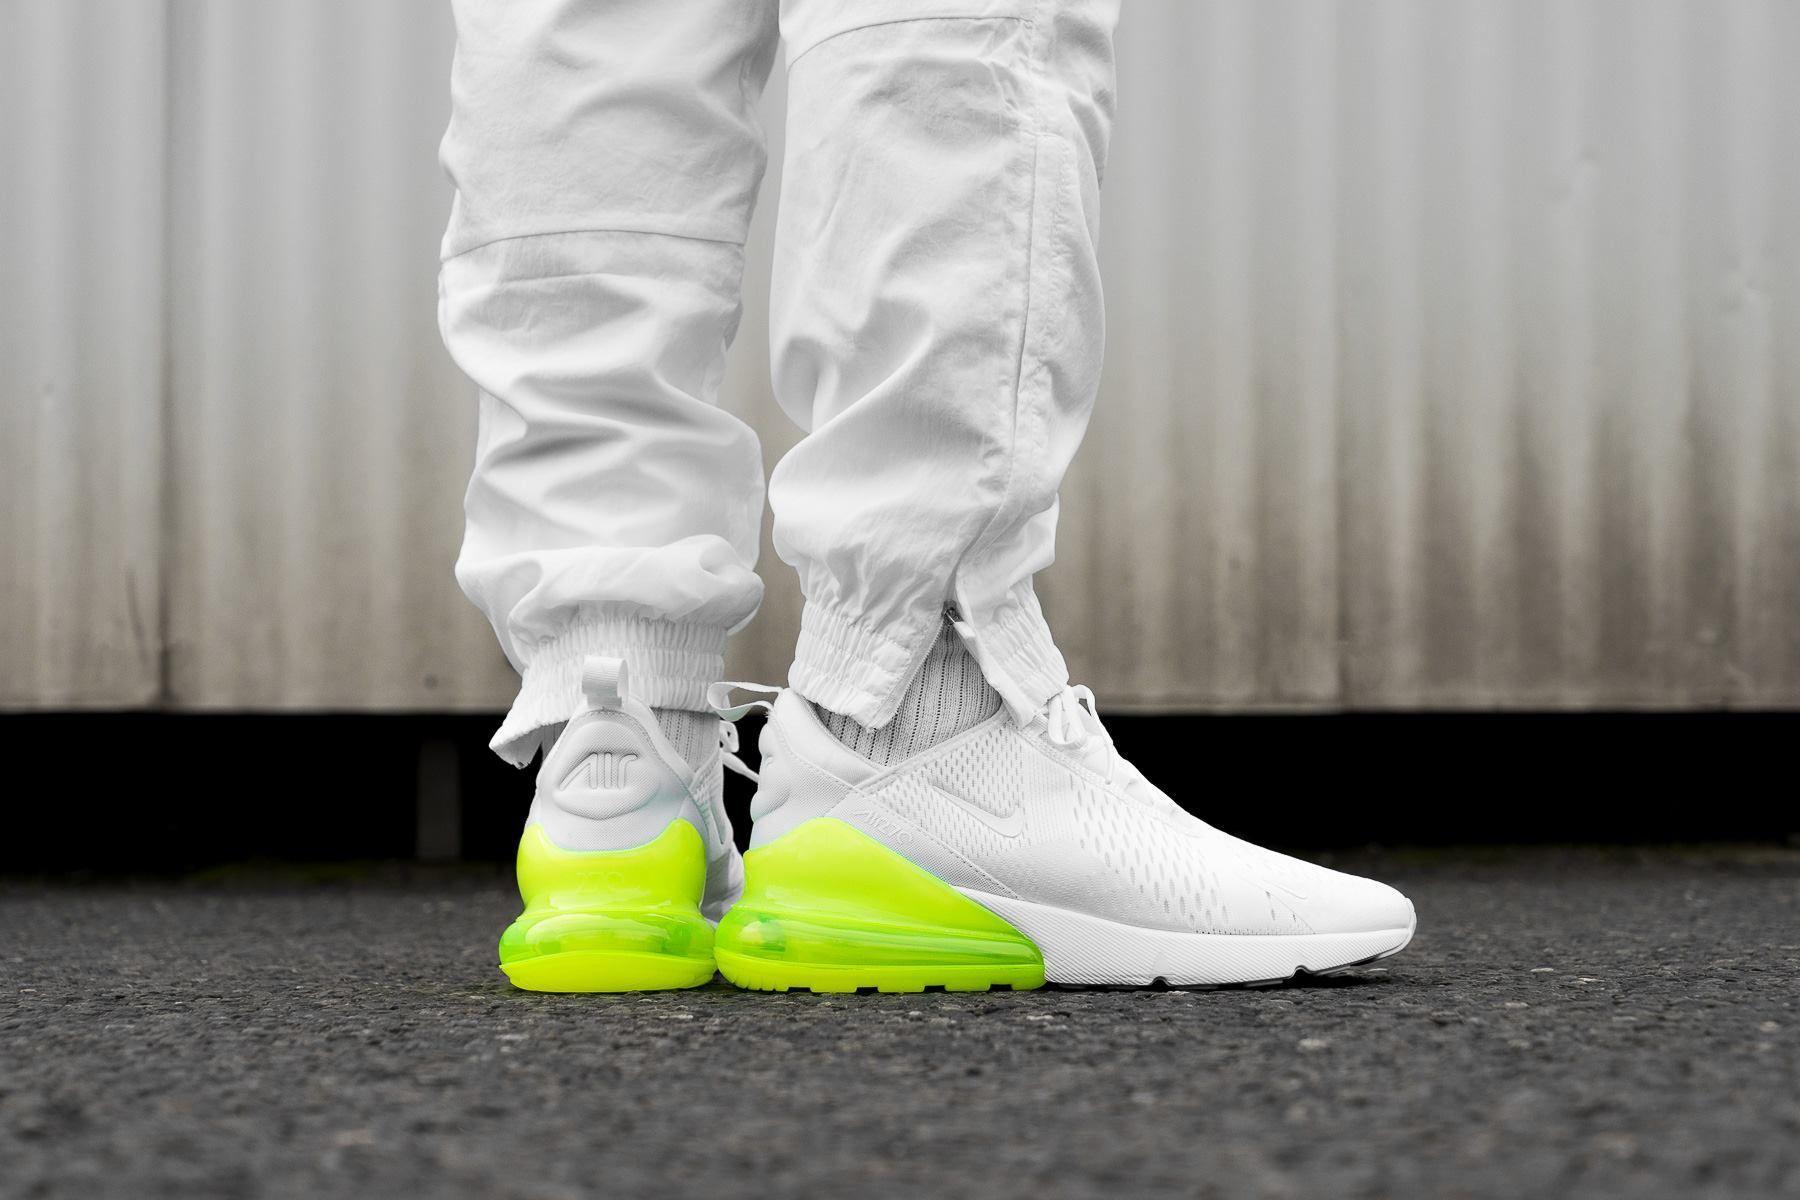 huge discount 5ad01 5f951 Nike Air Max · Timberland · Corredores · Zapatos Nike, Calzado Nike, Tenis,  Camisas, Deportes, Zapatillas De Tacos,